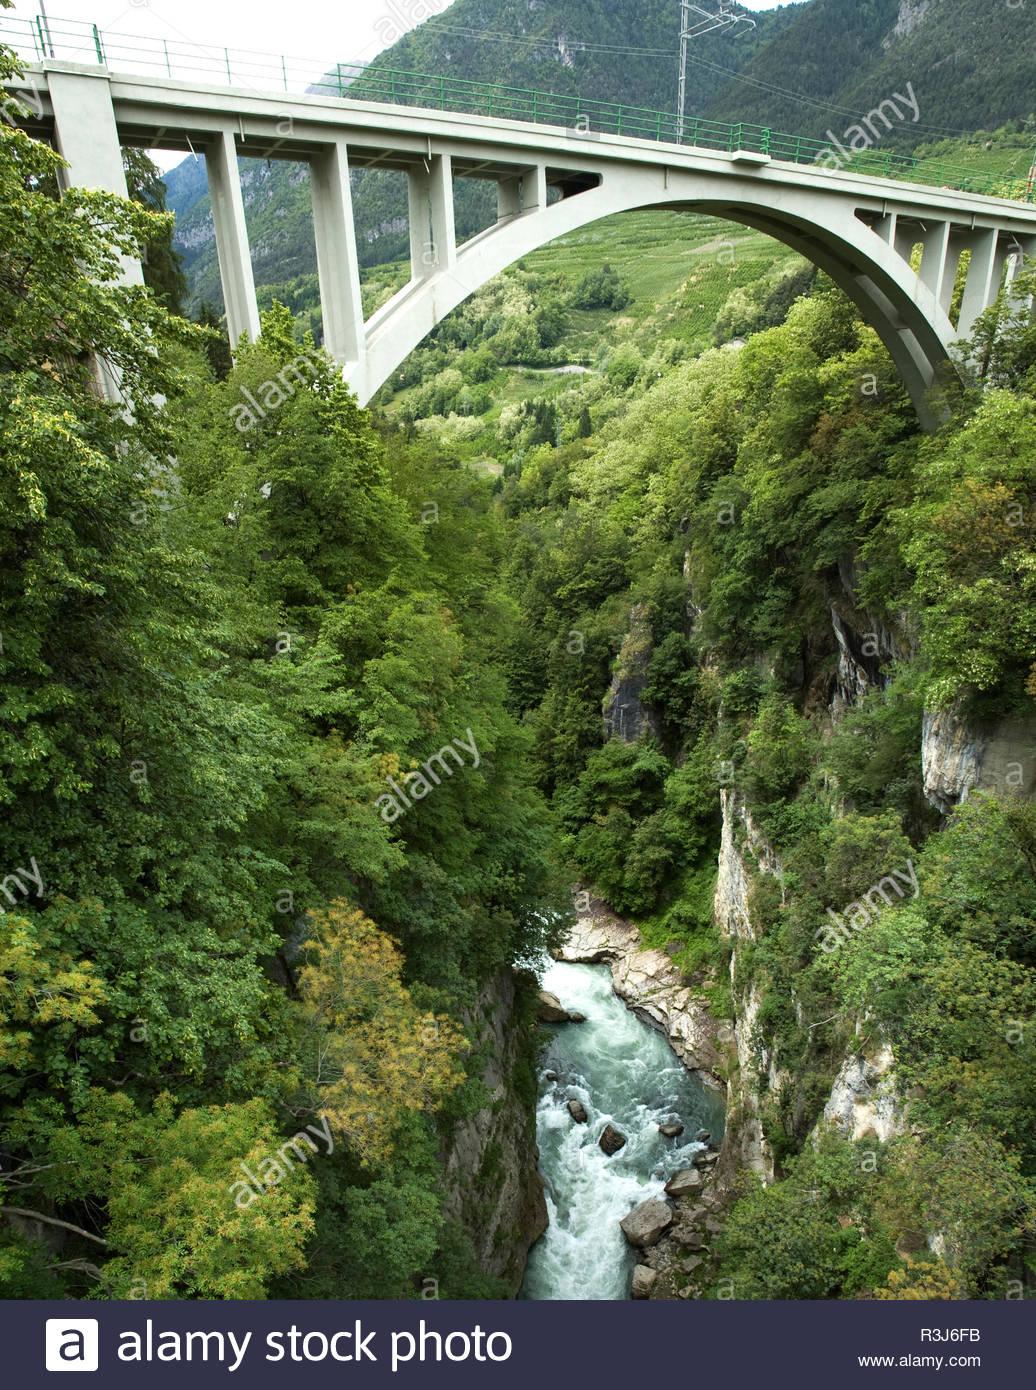 Brücke - Stock Image